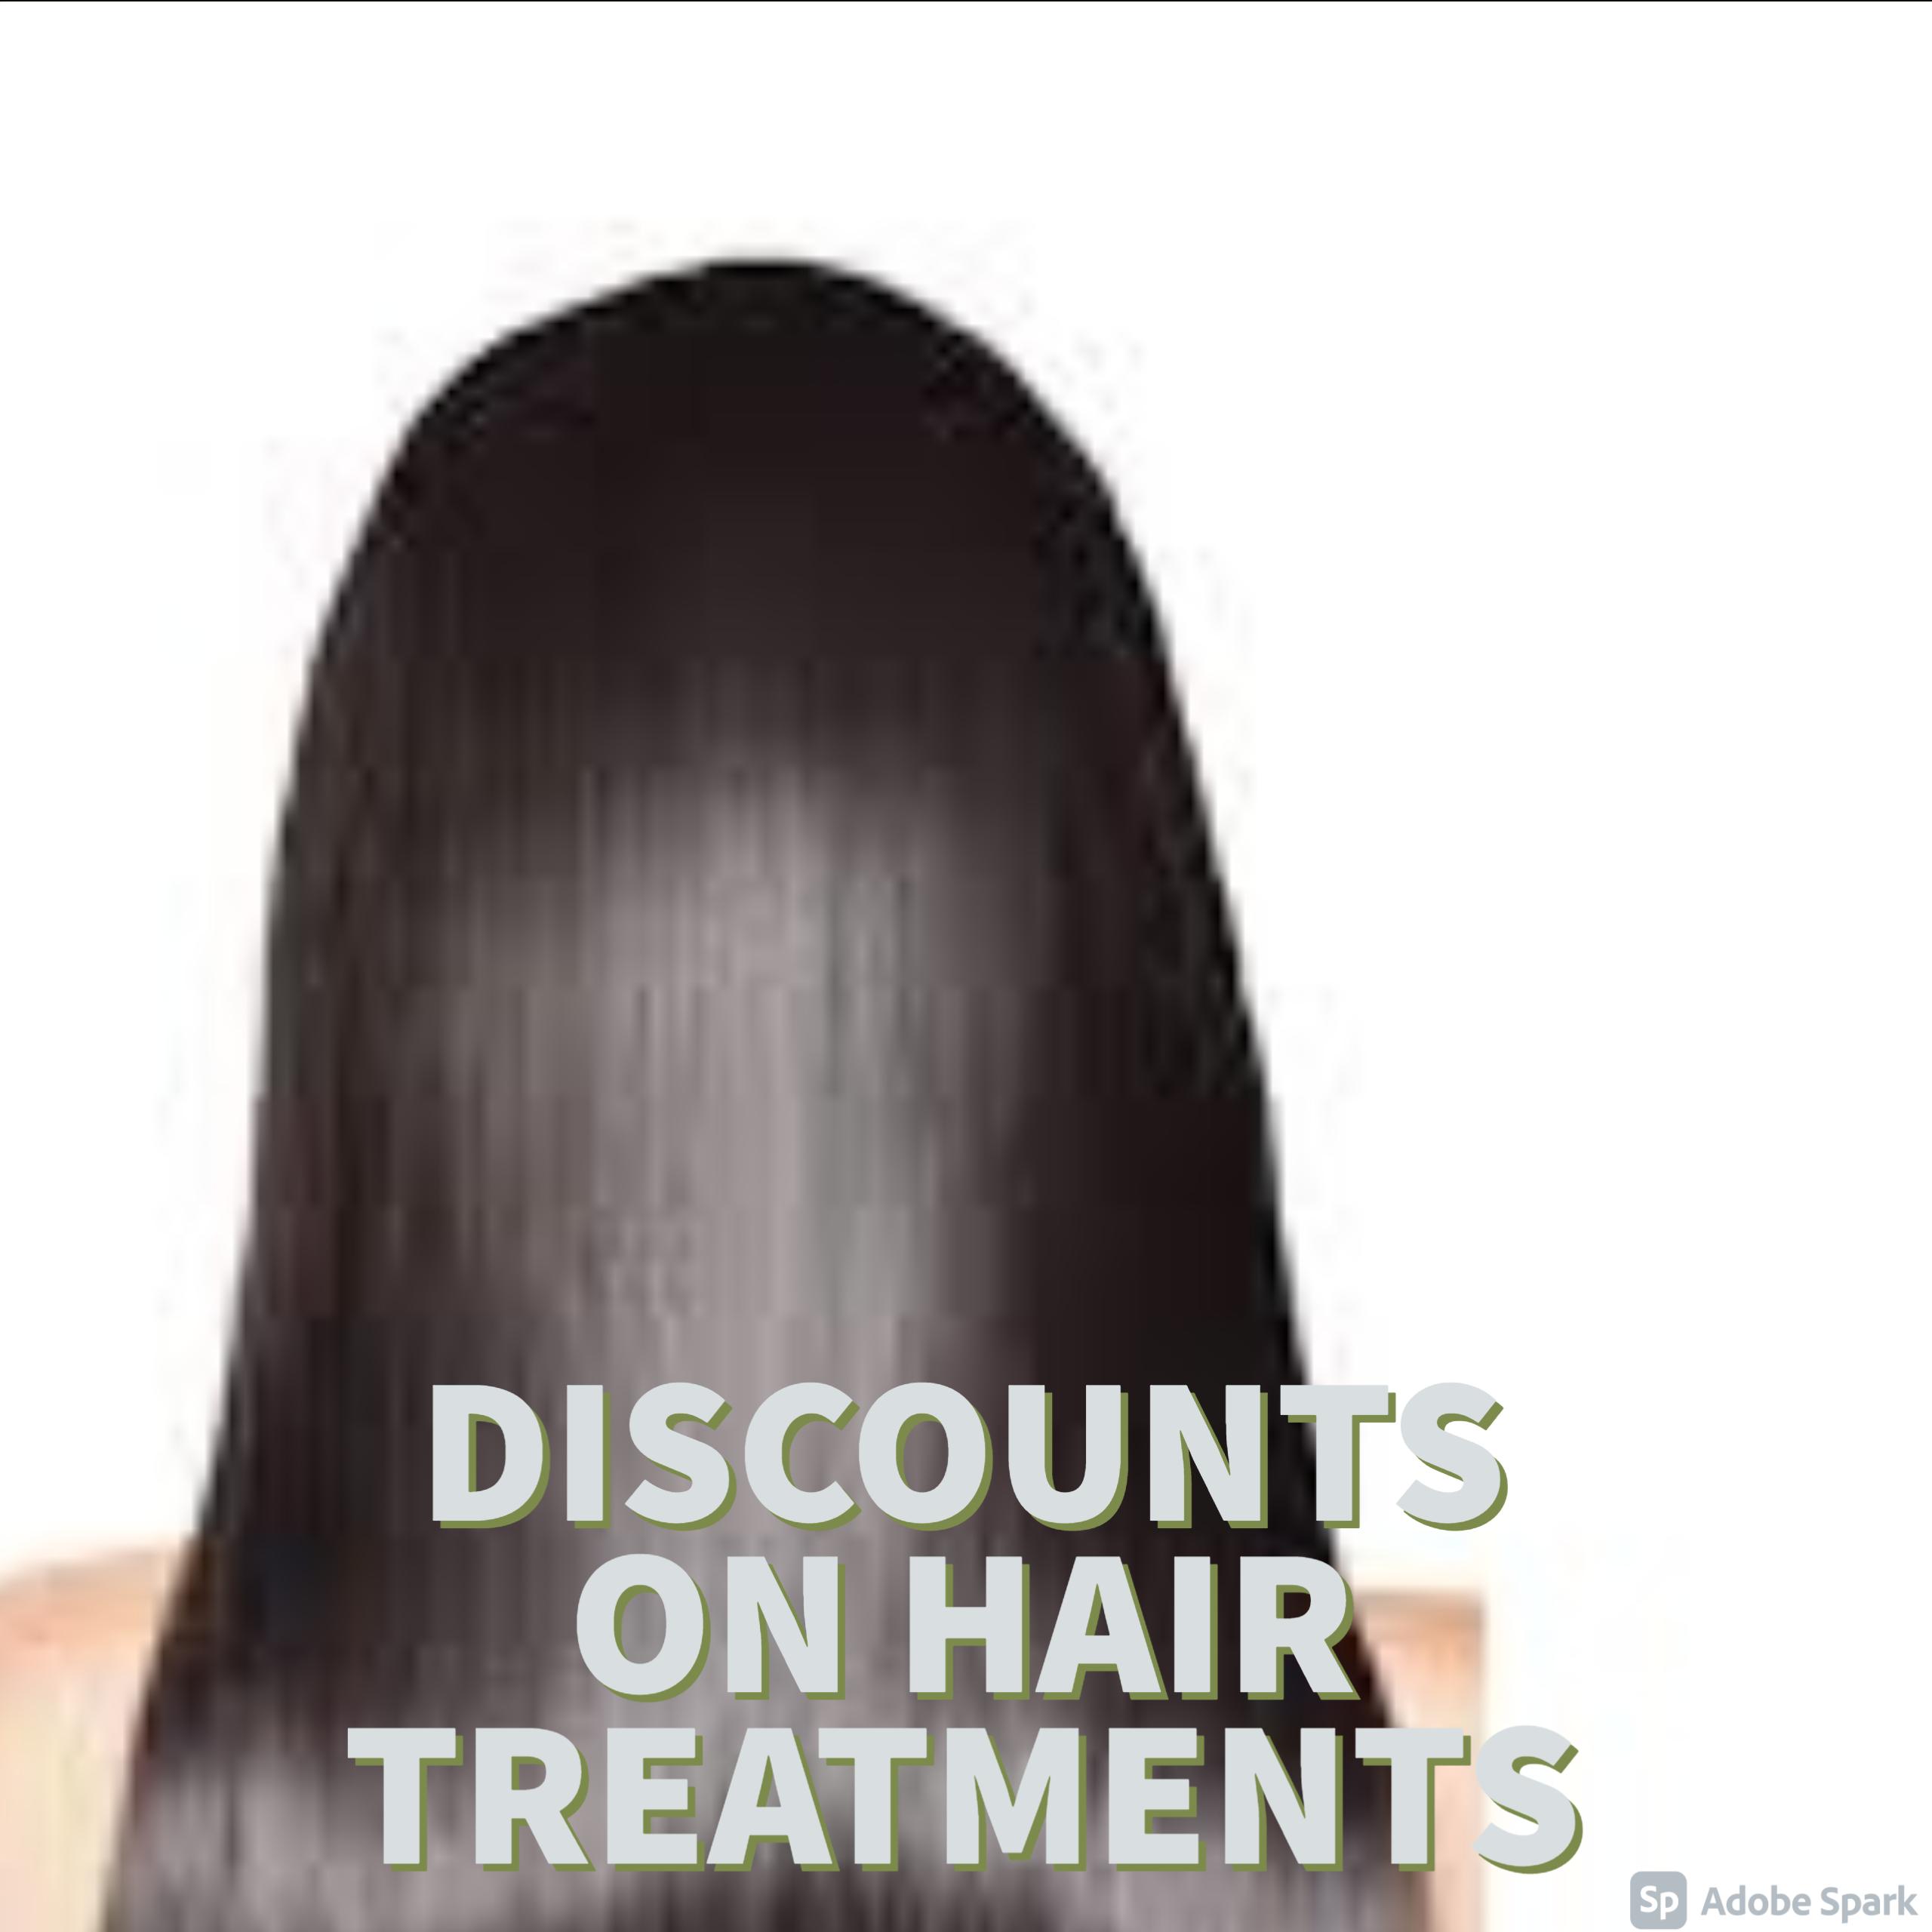 GREAT DISCOUNTS ON HAIR TRTEATMENTS | Livglam Anti Ageing Clinics | DISCOUNT HAIR TRANSPLANT DISCOUNT HAIR LOSS DISCOUNT - GL101123